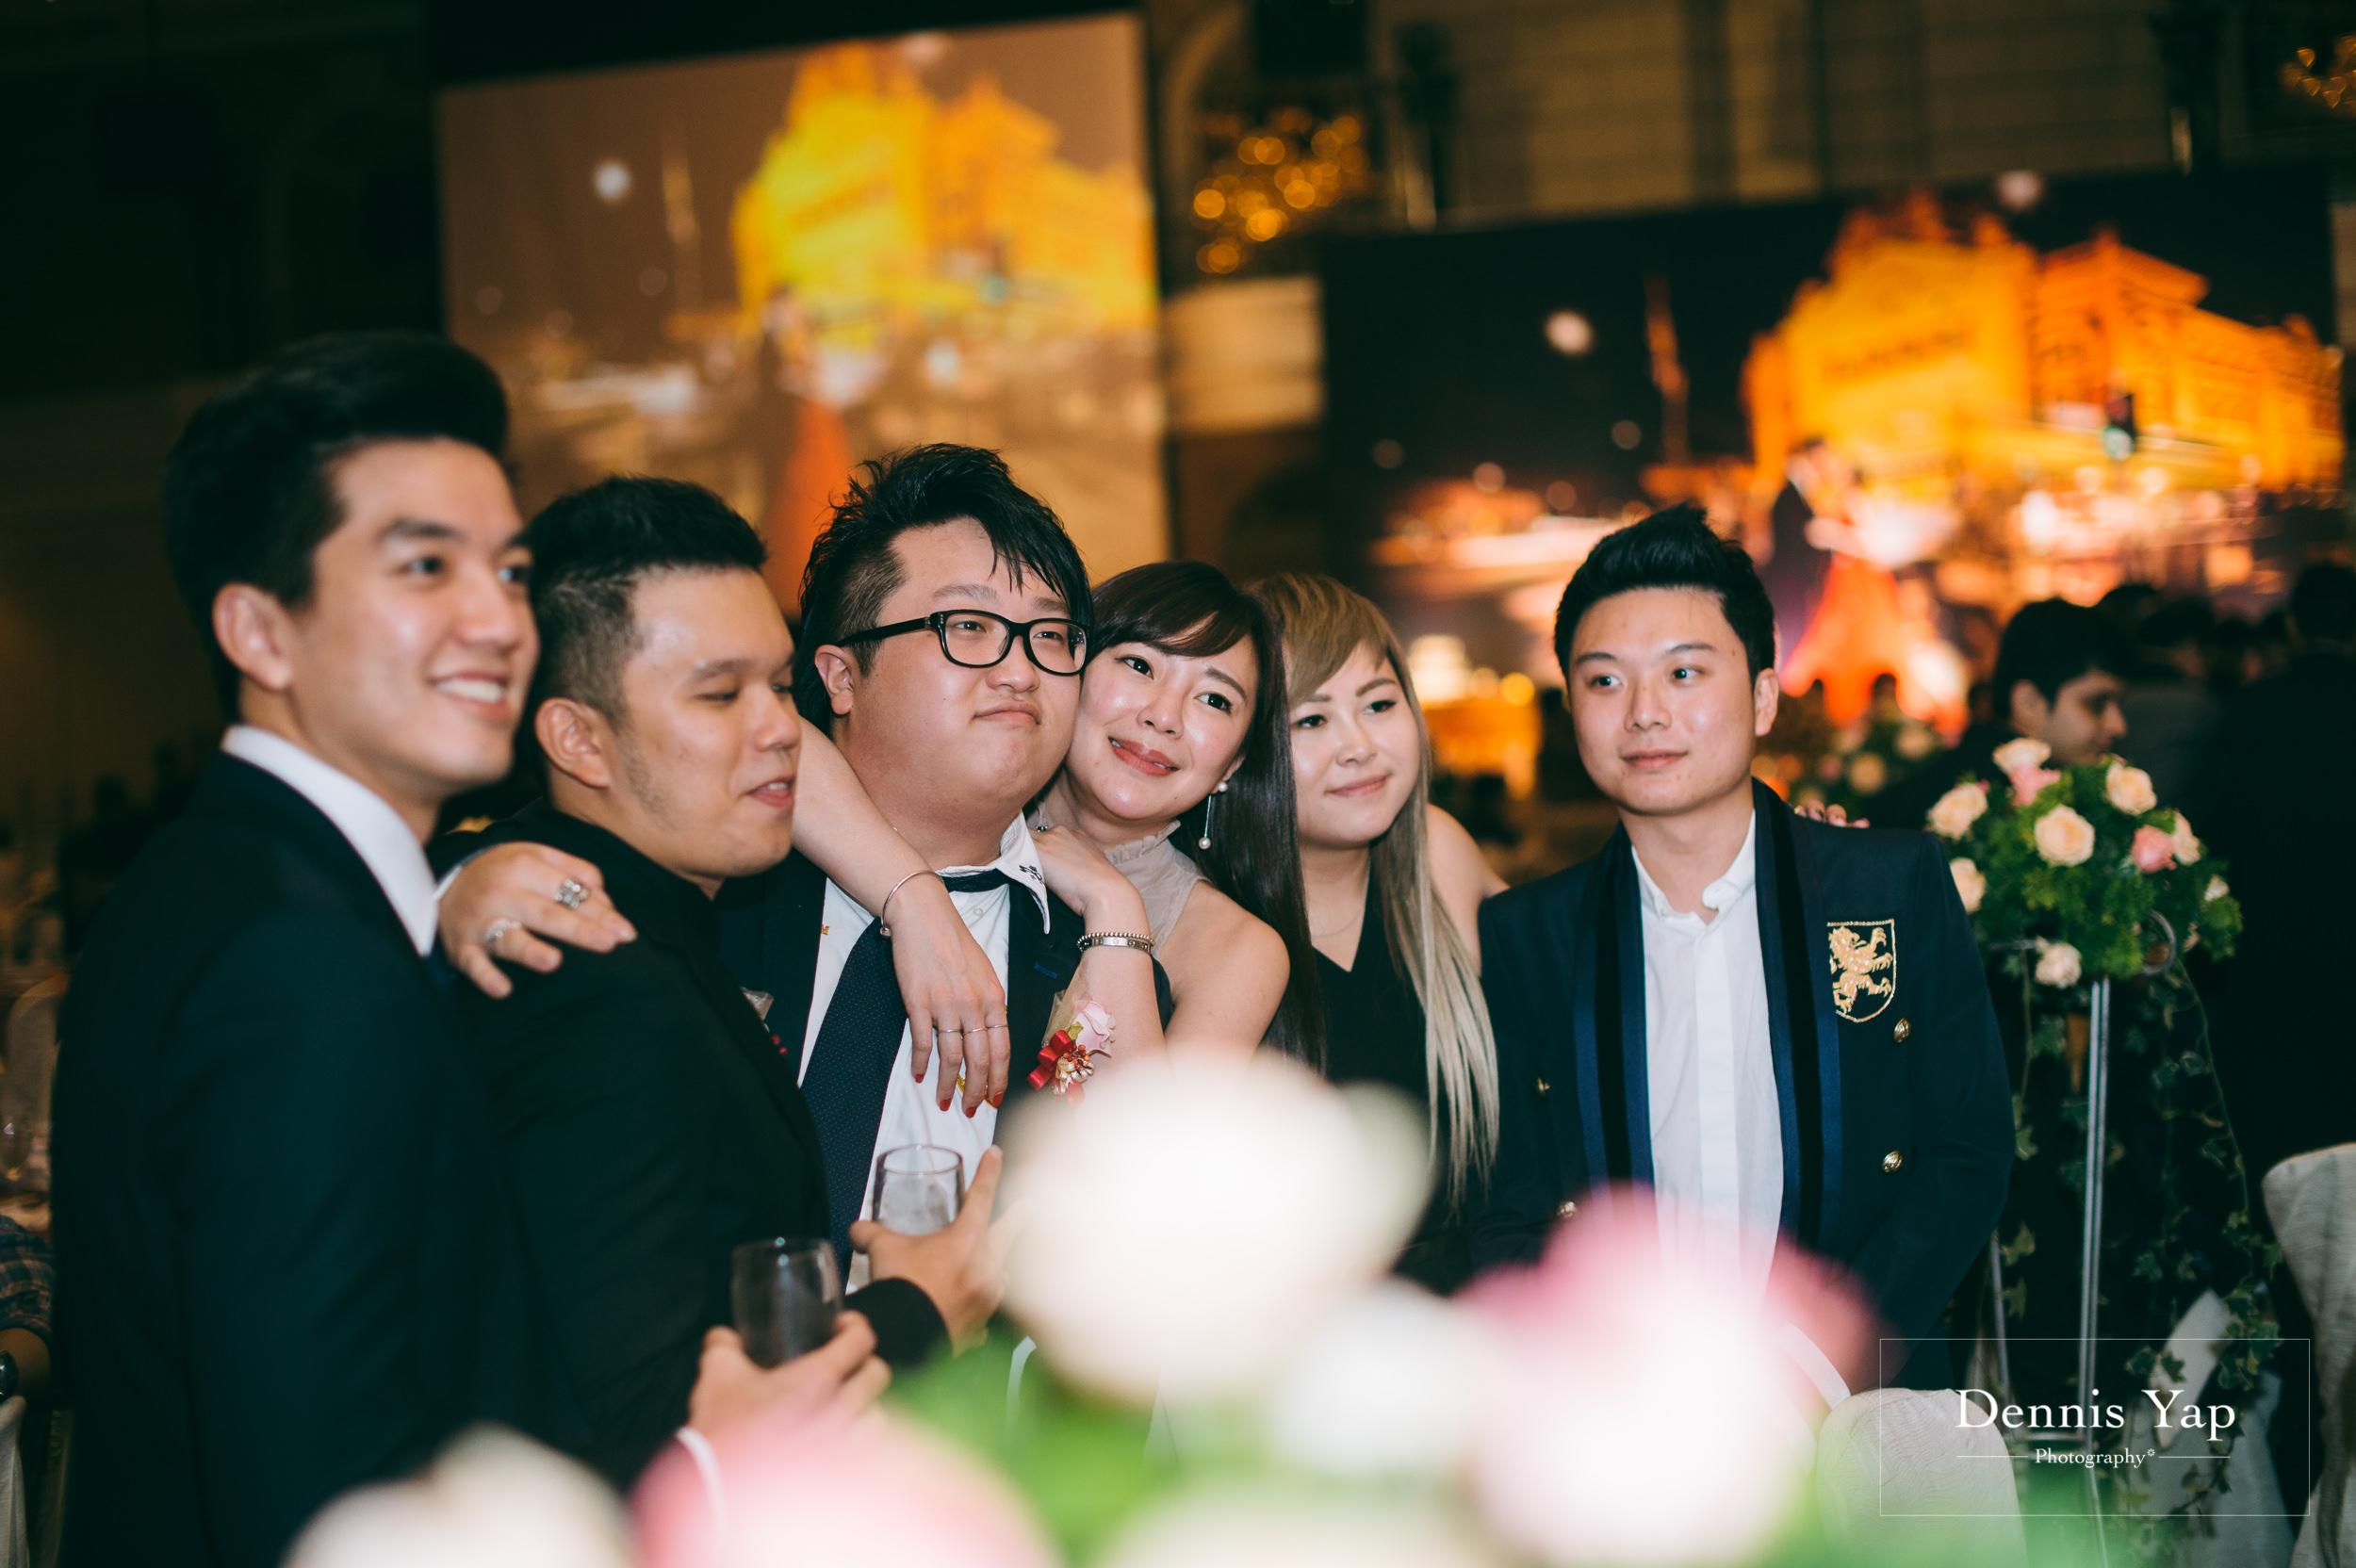 ivan constance wedding day renaissance hotel dennis yap photography-40.jpg